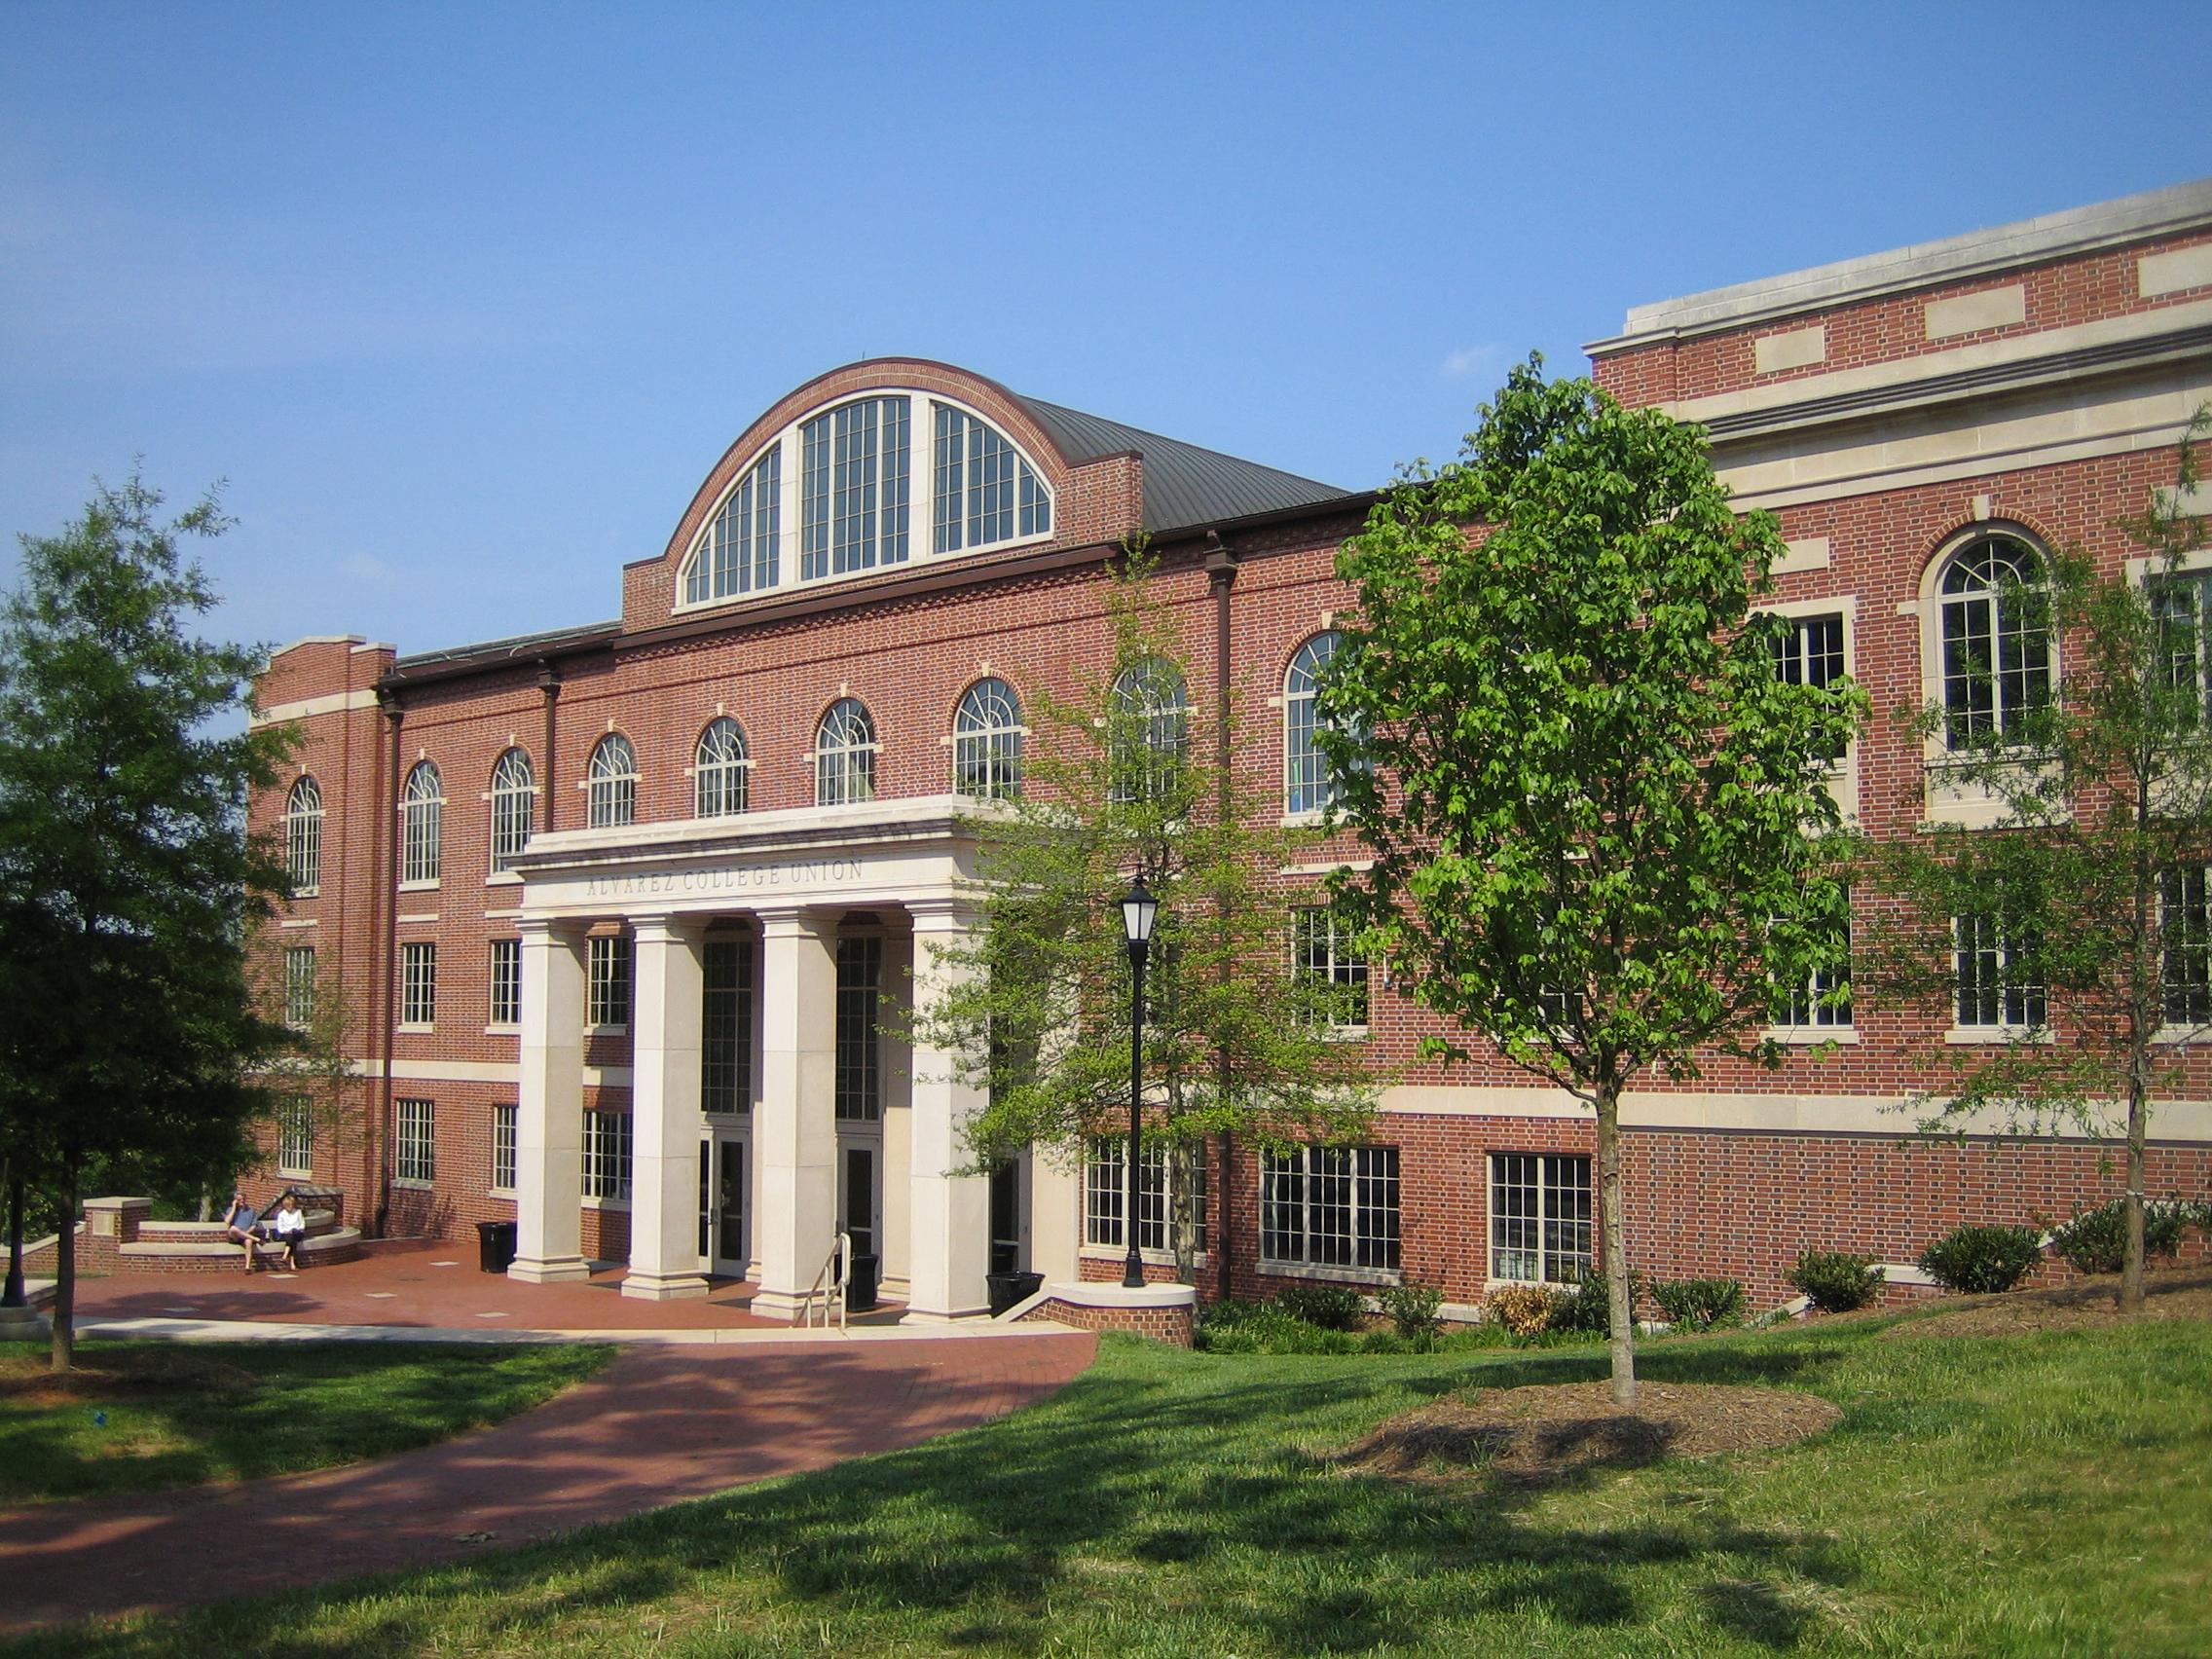 Alvarez_College_Union,_Davidson_College,_NC.jpg